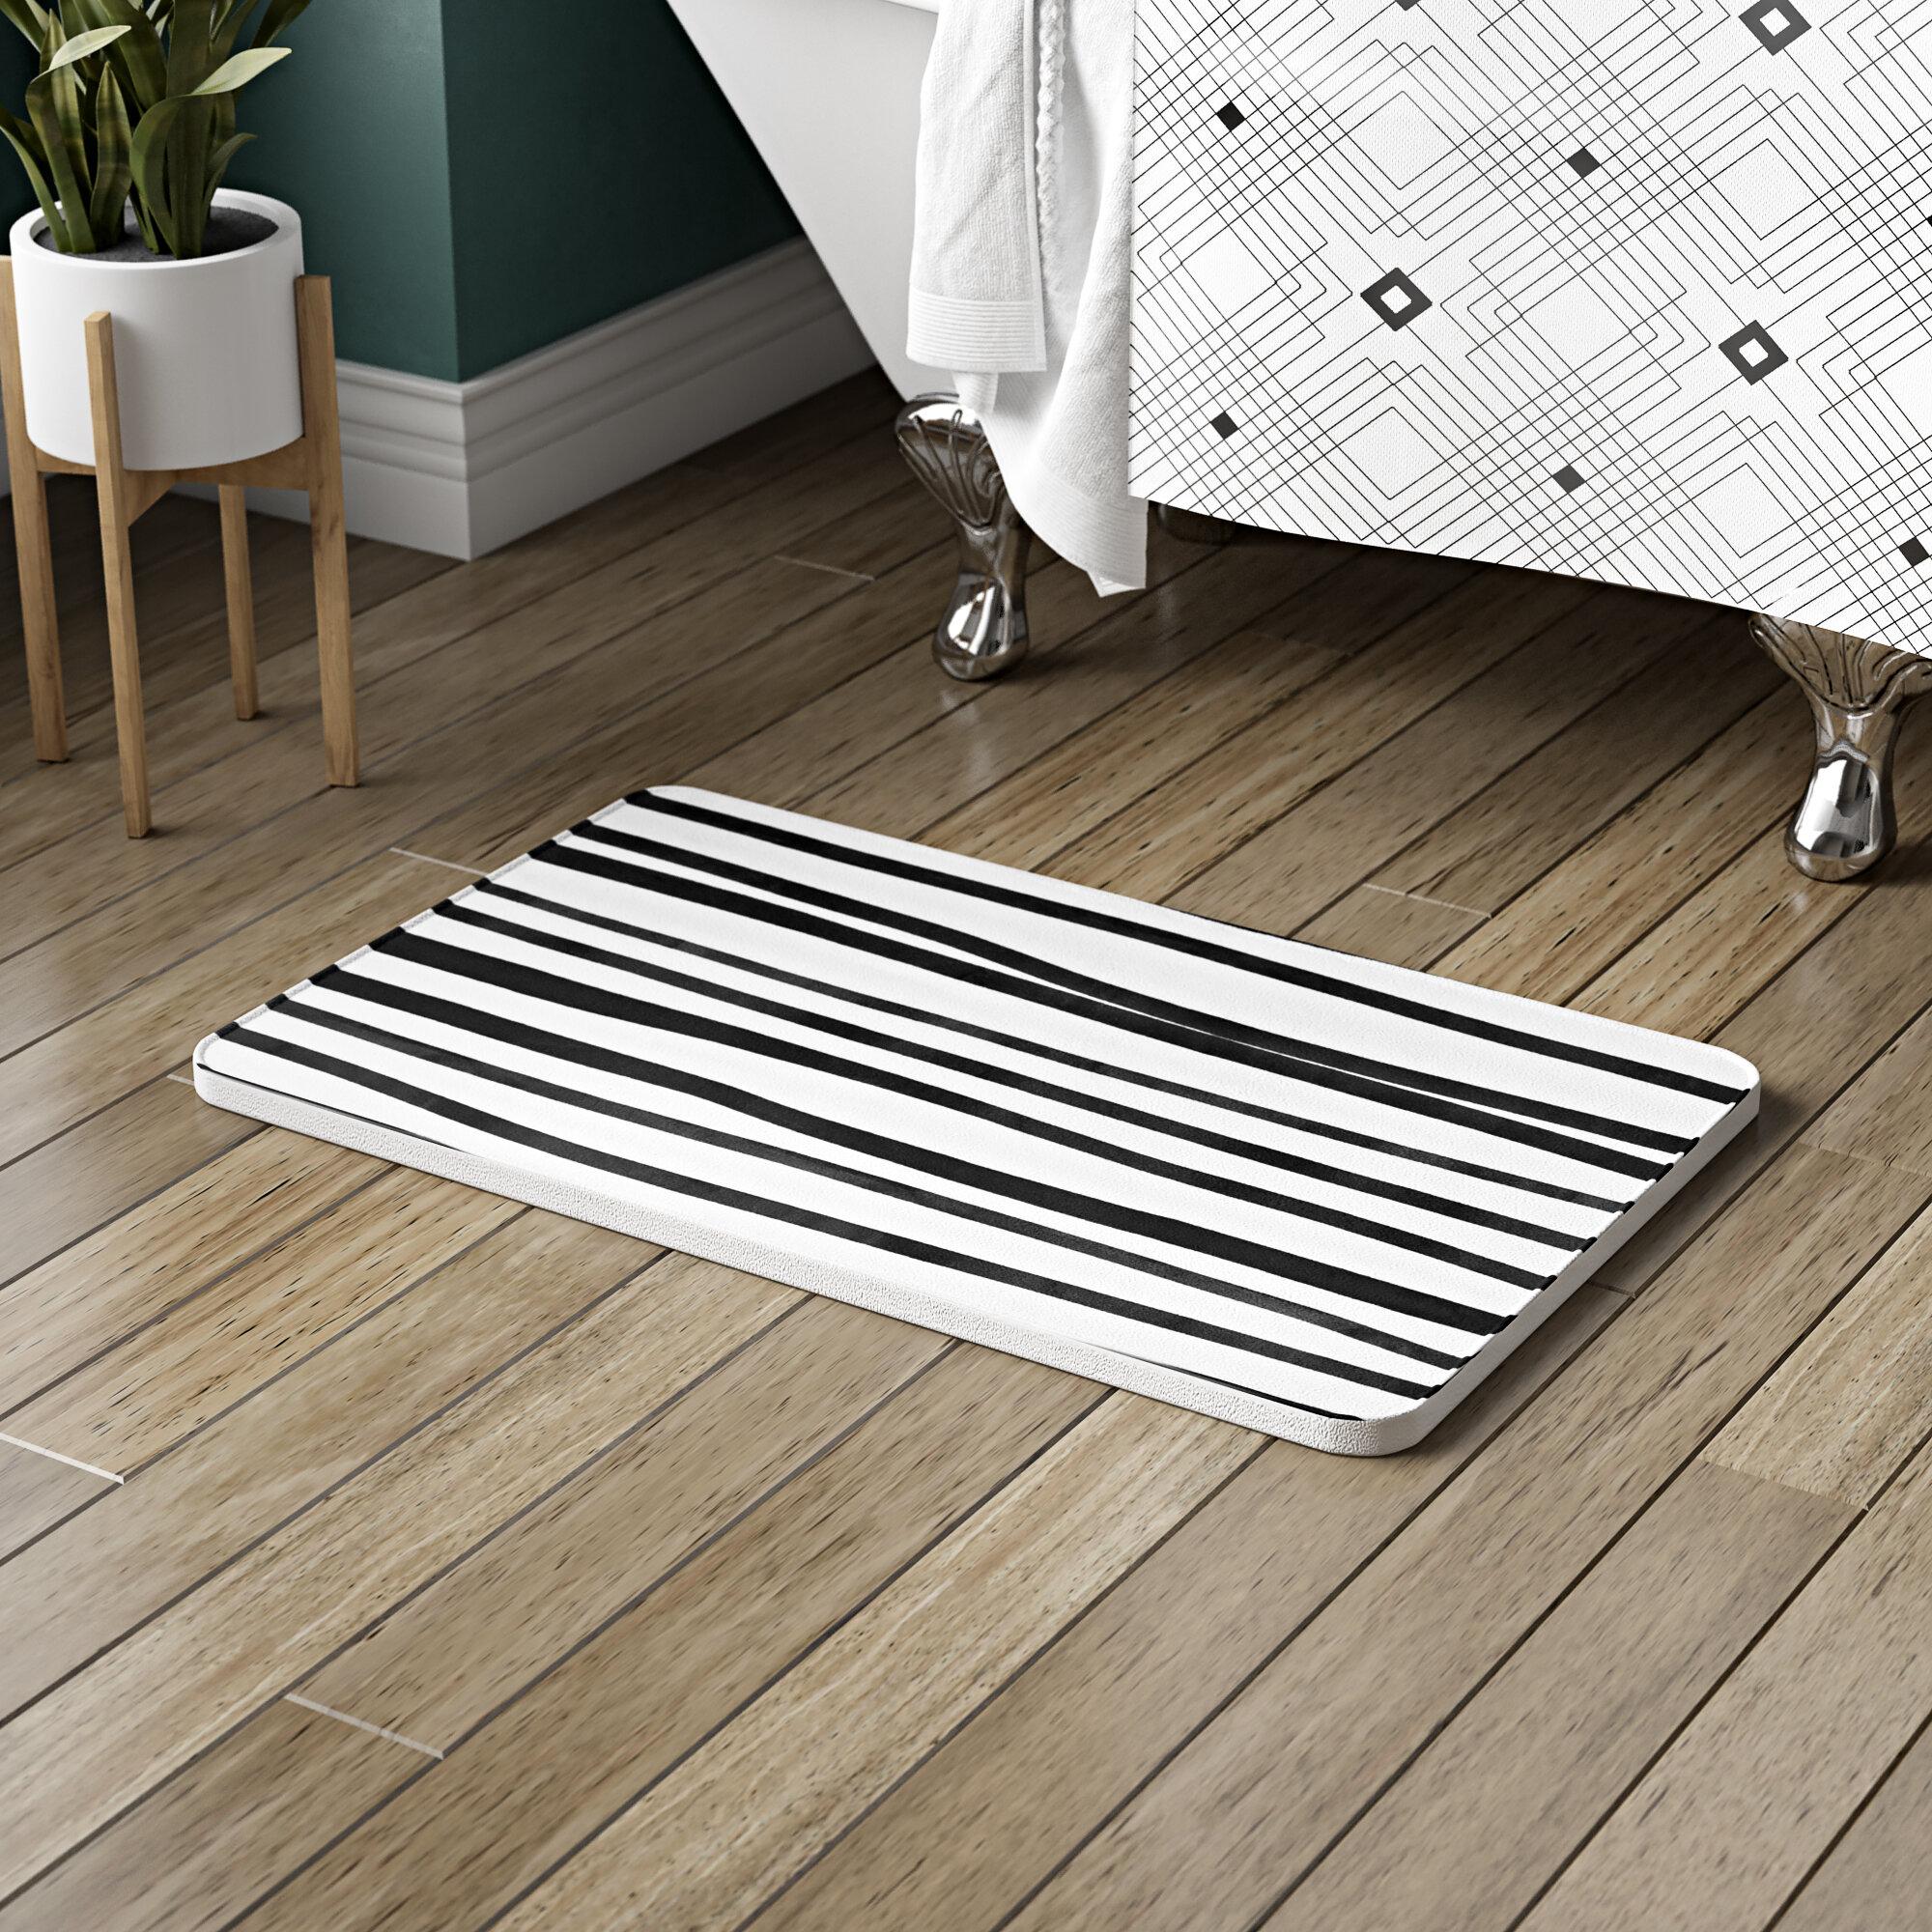 Picture of: Ivy Bronx Bretz Stripes Rectangle Non Slip Striped Bath Rug